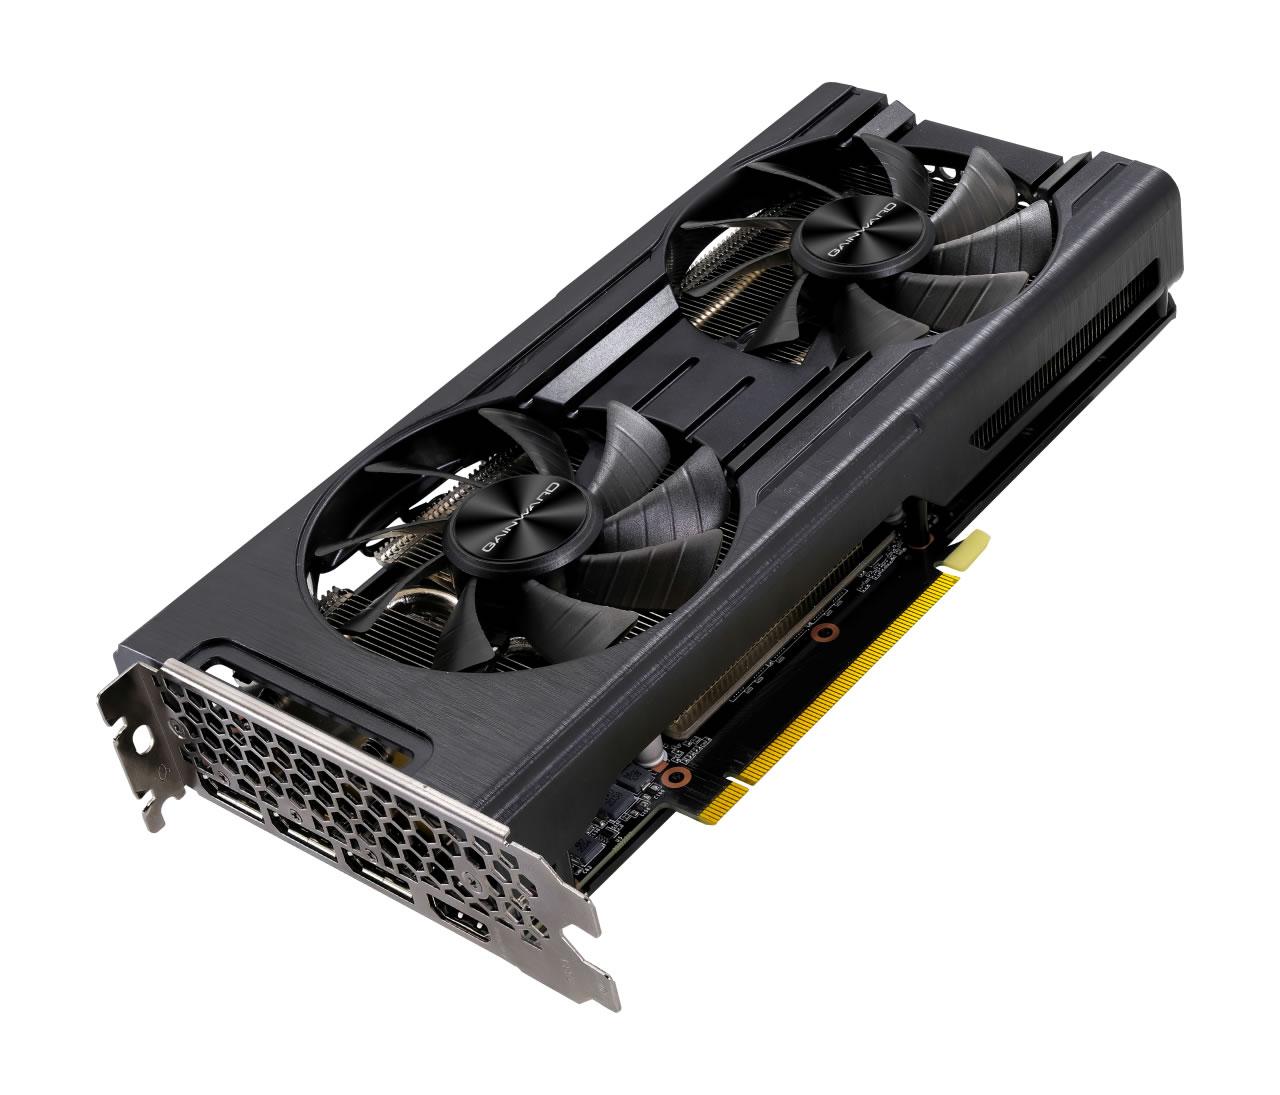 Placa de Vídeo Gainward GeForce RTX 3060 Ghost 12GB GDDR6 192bit NE63060019K9-190AU